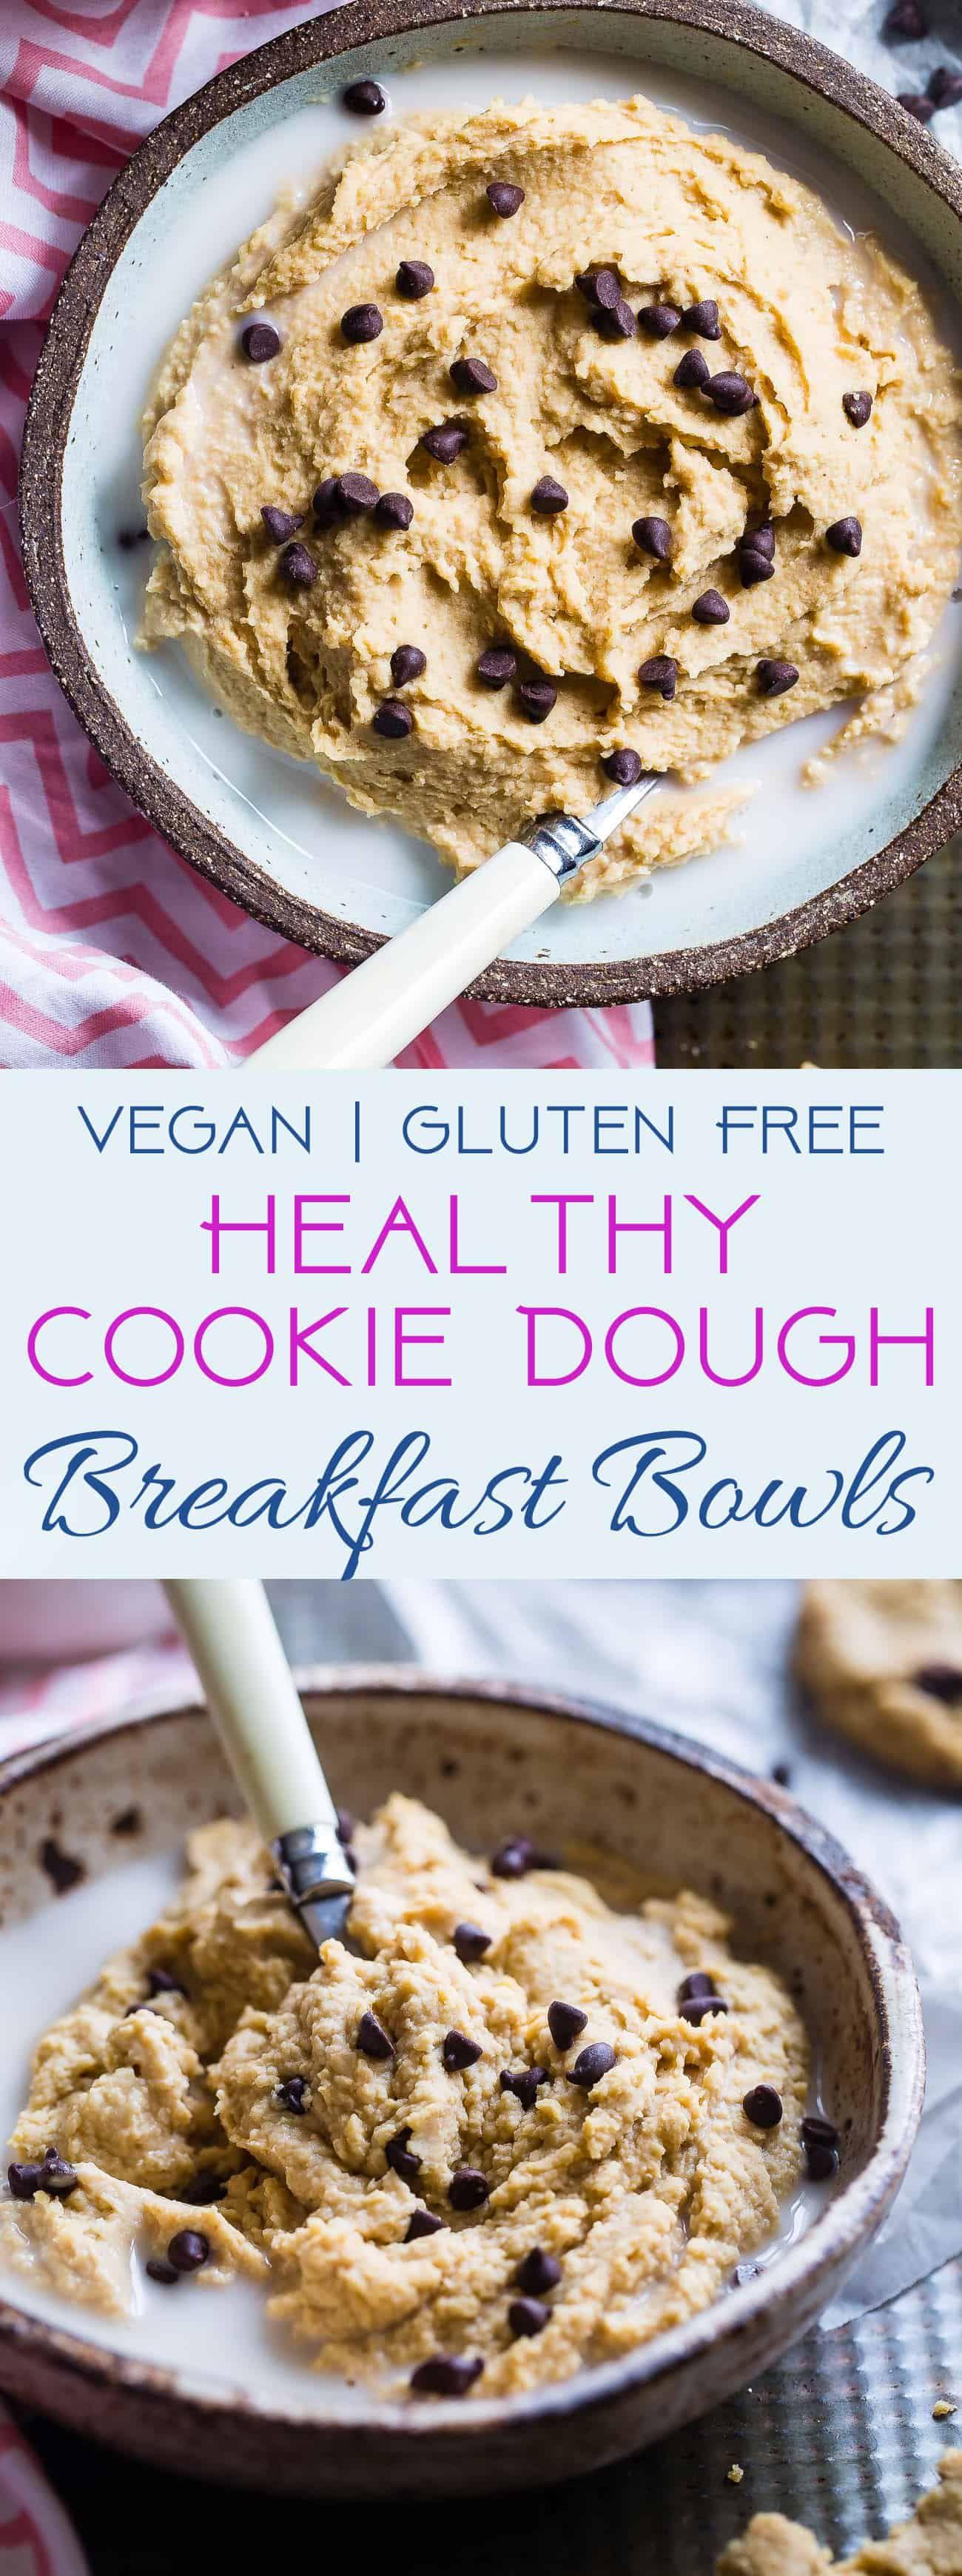 Vegan Chickpea Cookie Dough Bowls | Food Faith Fitness